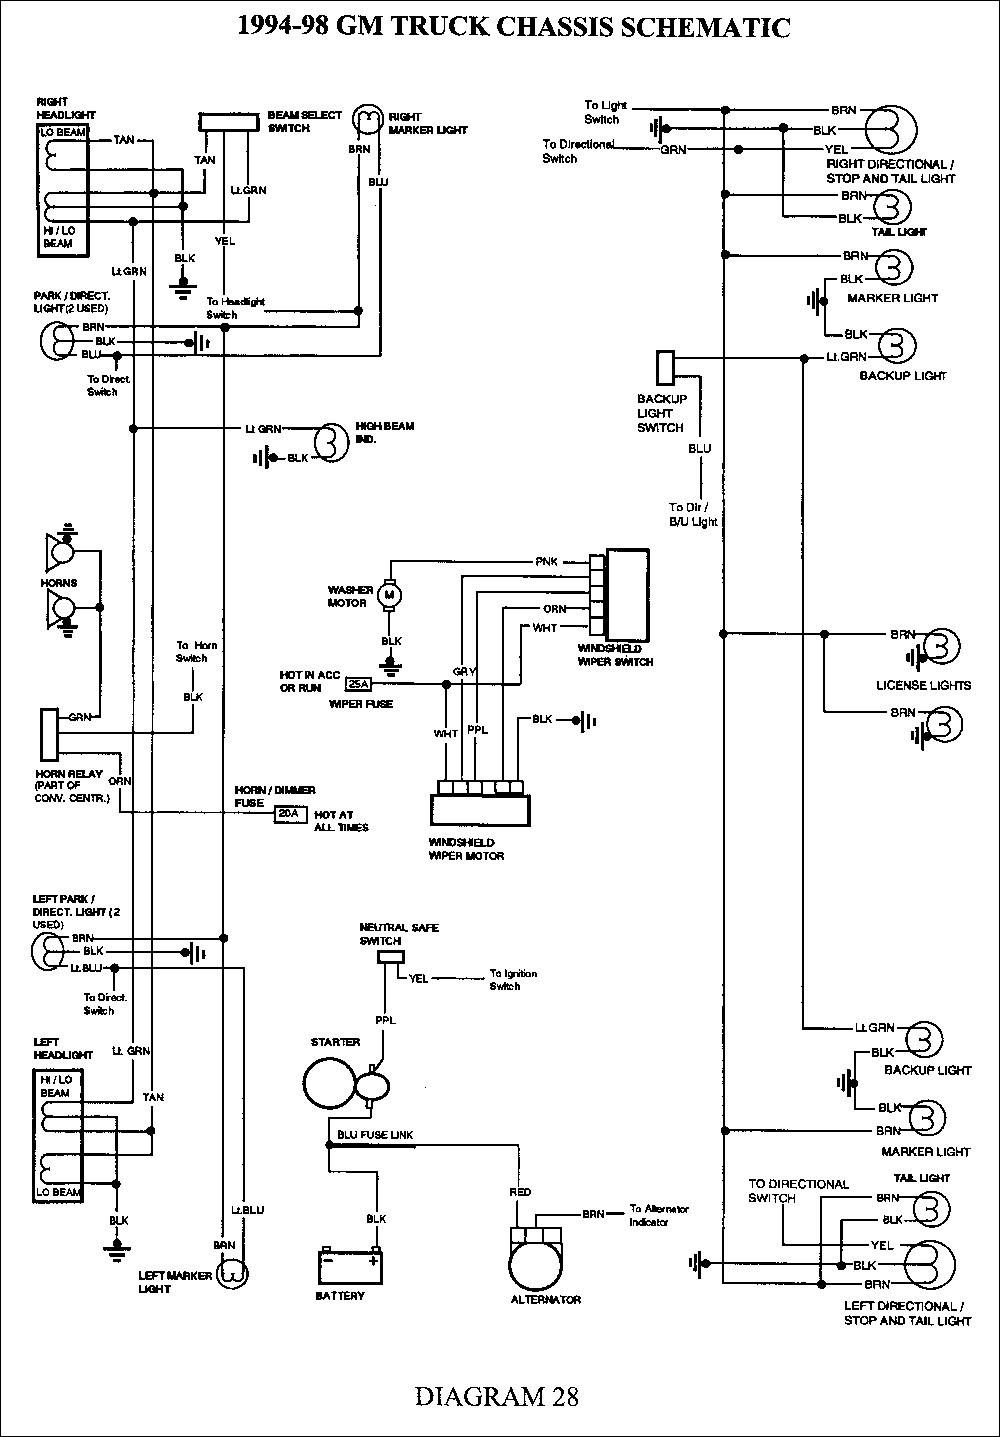 2000 chevy 3500 wiring diagram 2000 chevy van wiring diagram wiring diagrams blog  2000 chevy van wiring diagram wiring